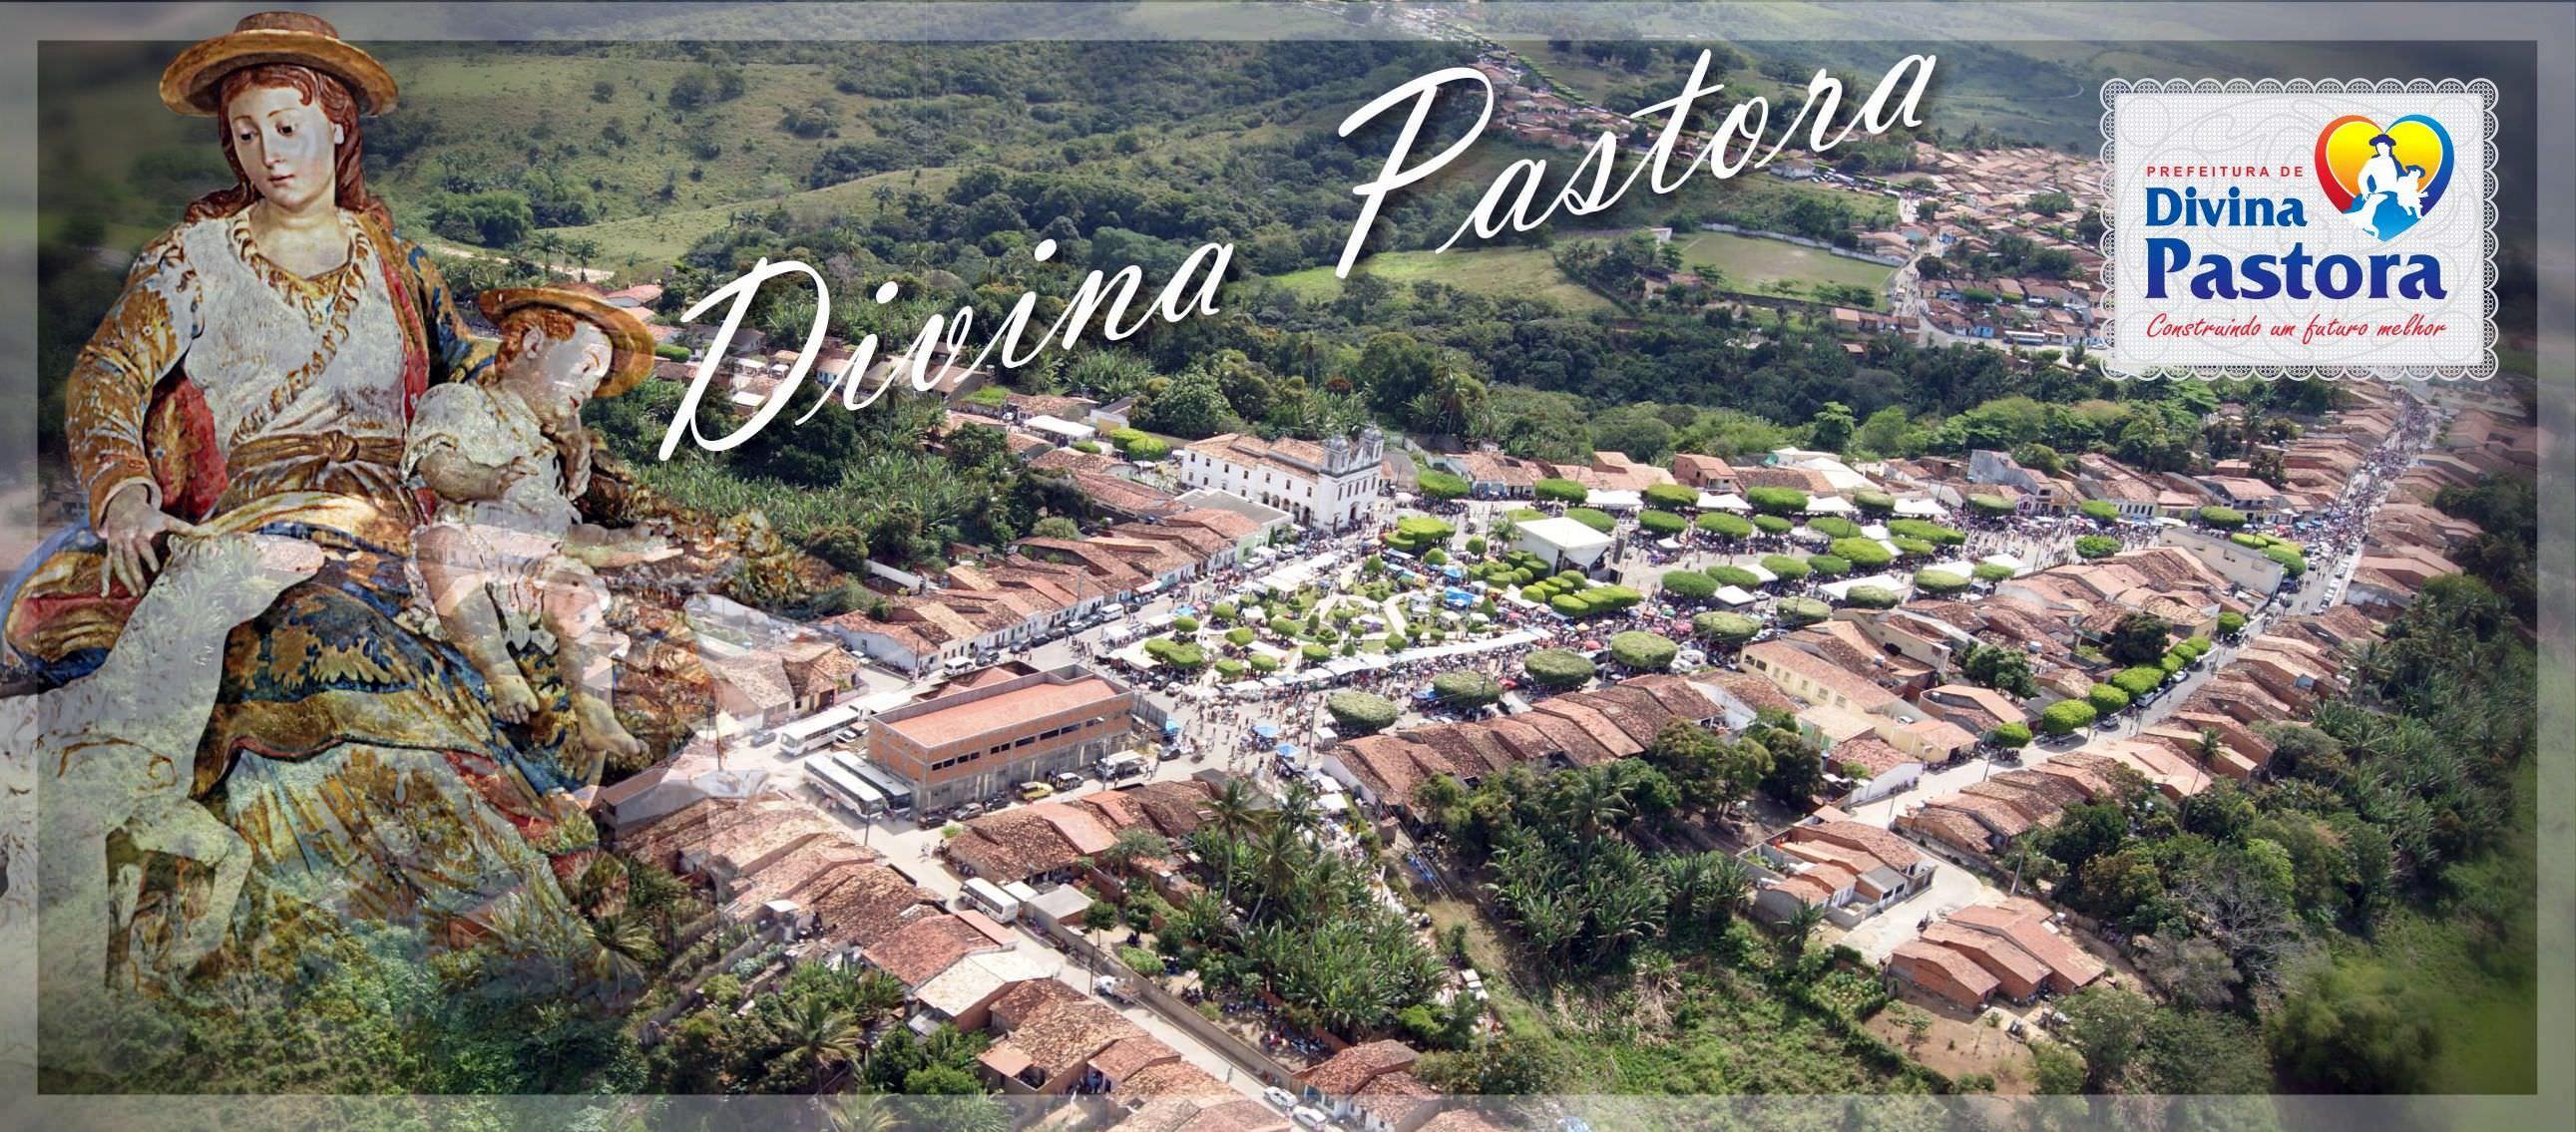 Divina Pastora Sergipe fonte: nds-lasolitude.org